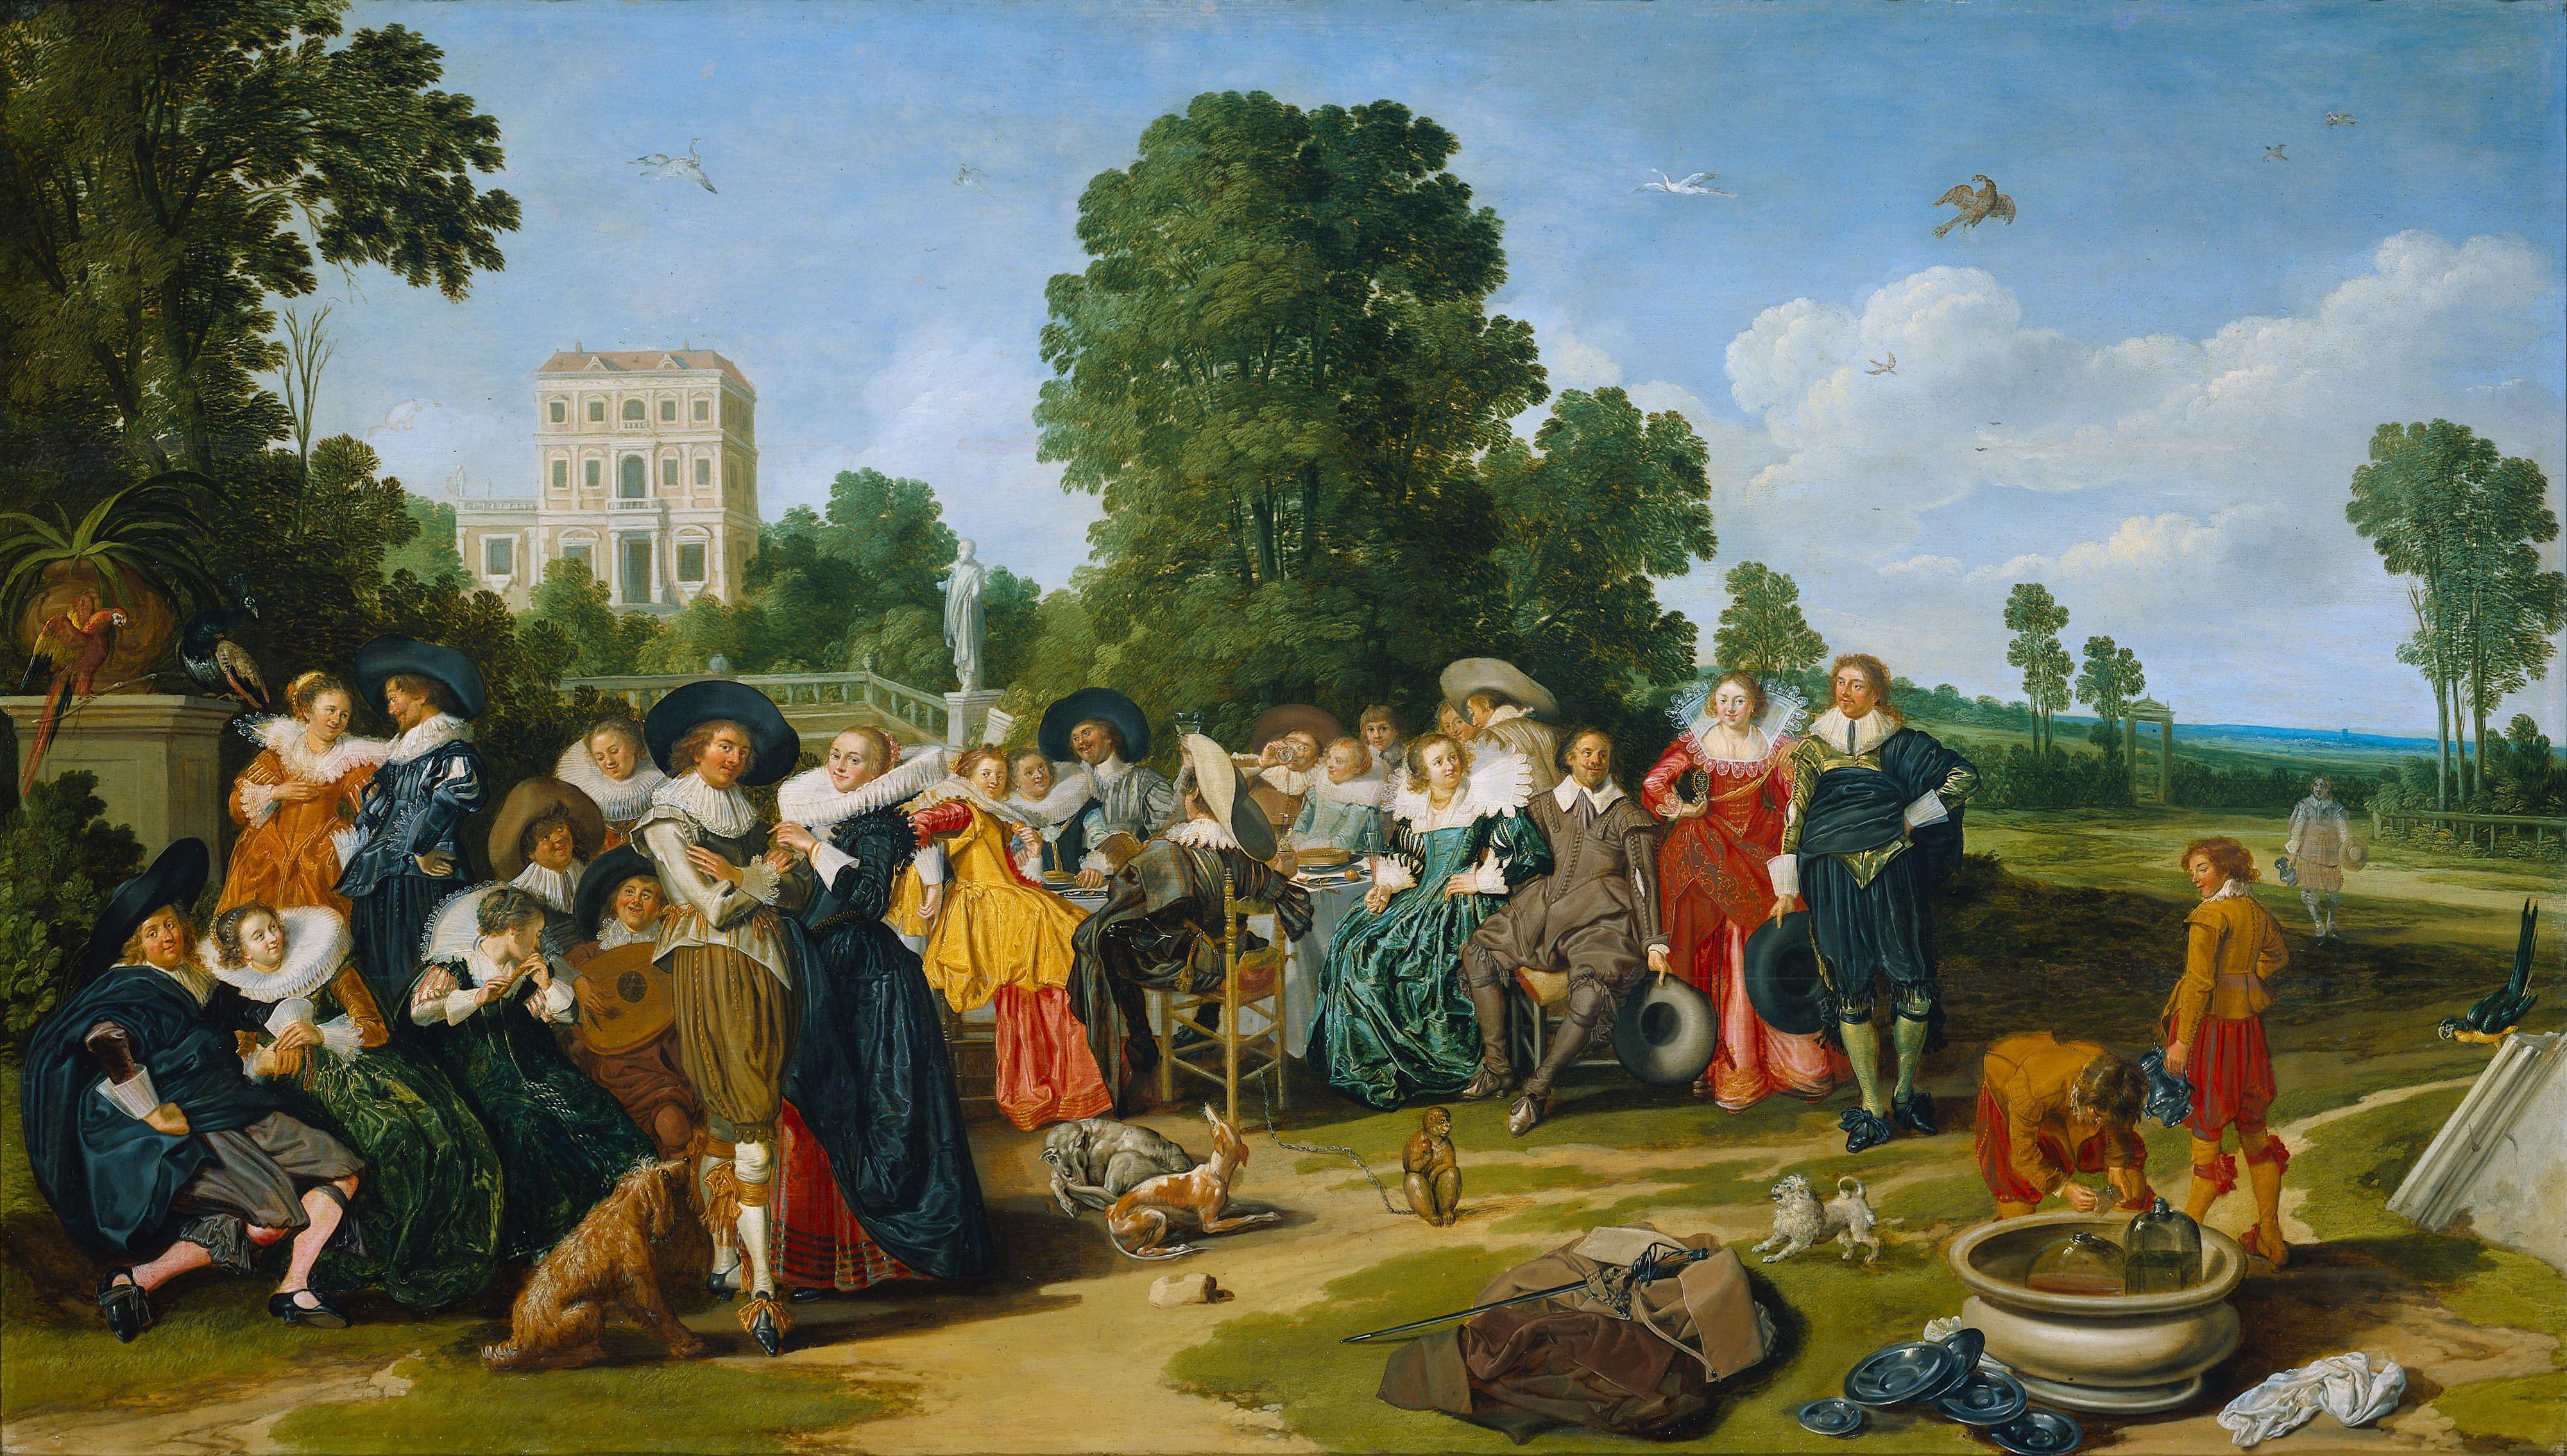 Filefete Champetre (1627) Dirck Halsjpg  Wikimedia Commons